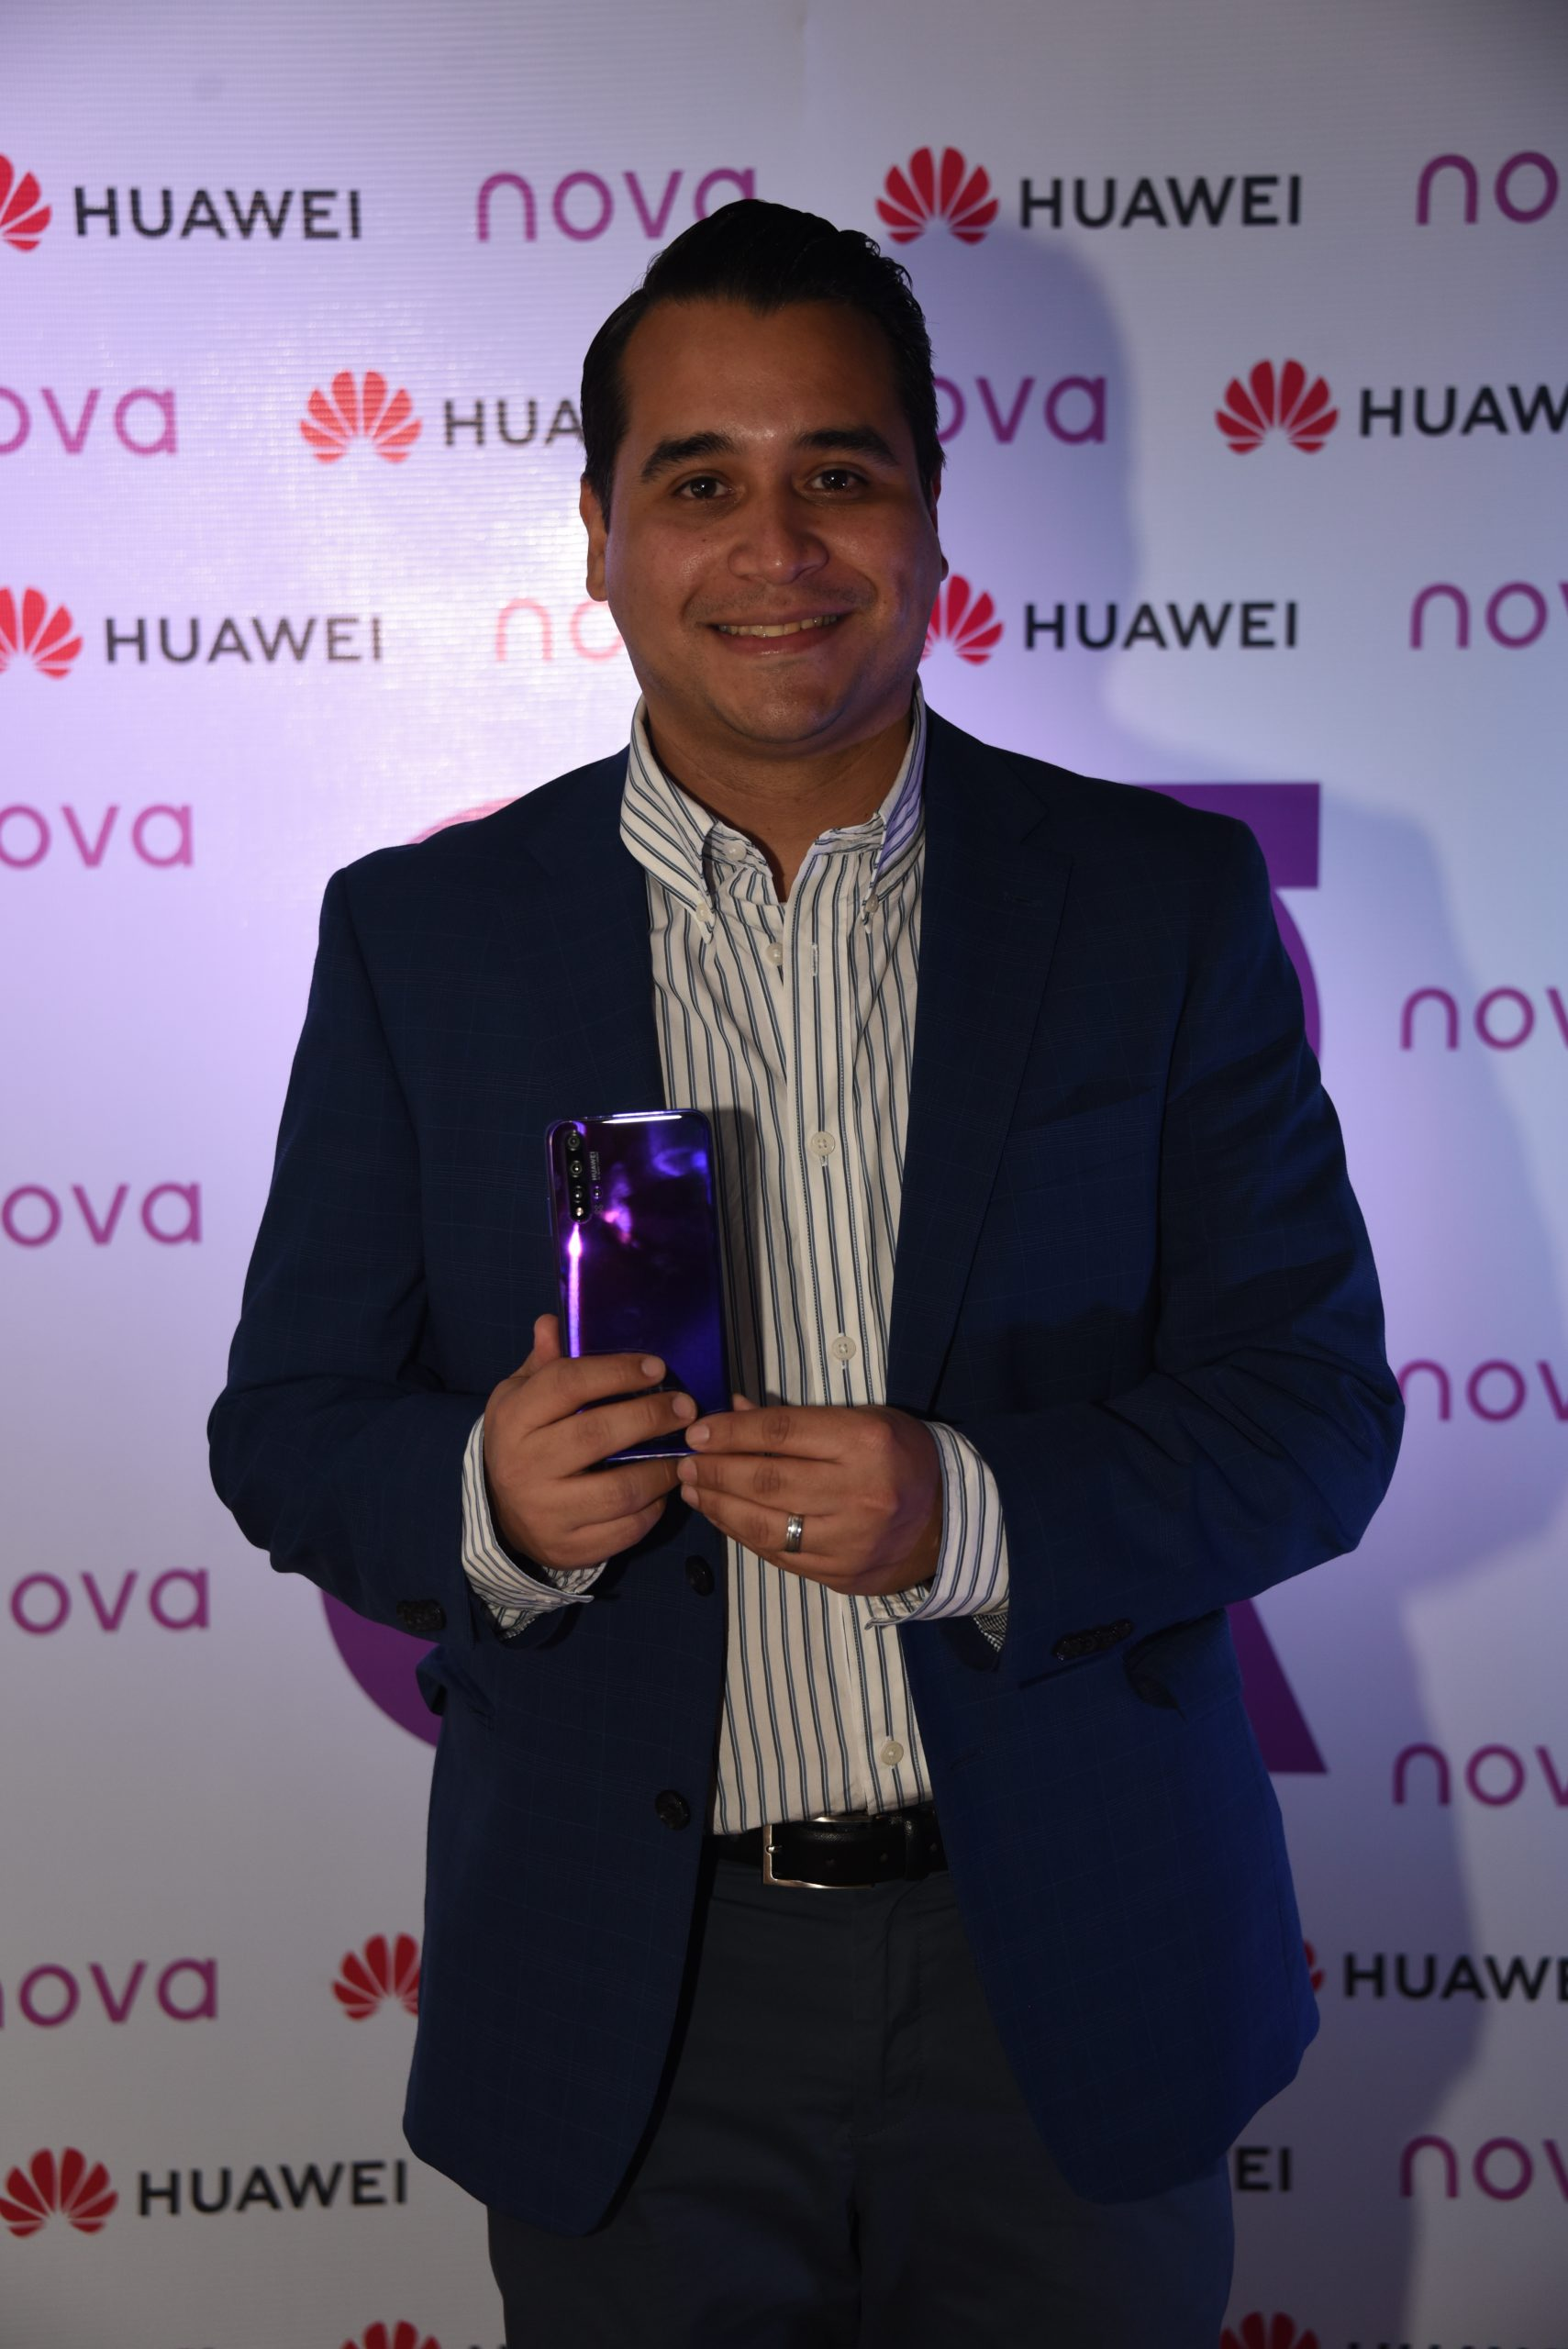 Inspira tu momento con las cinco cámaras IA del HUAWEI nova 5T